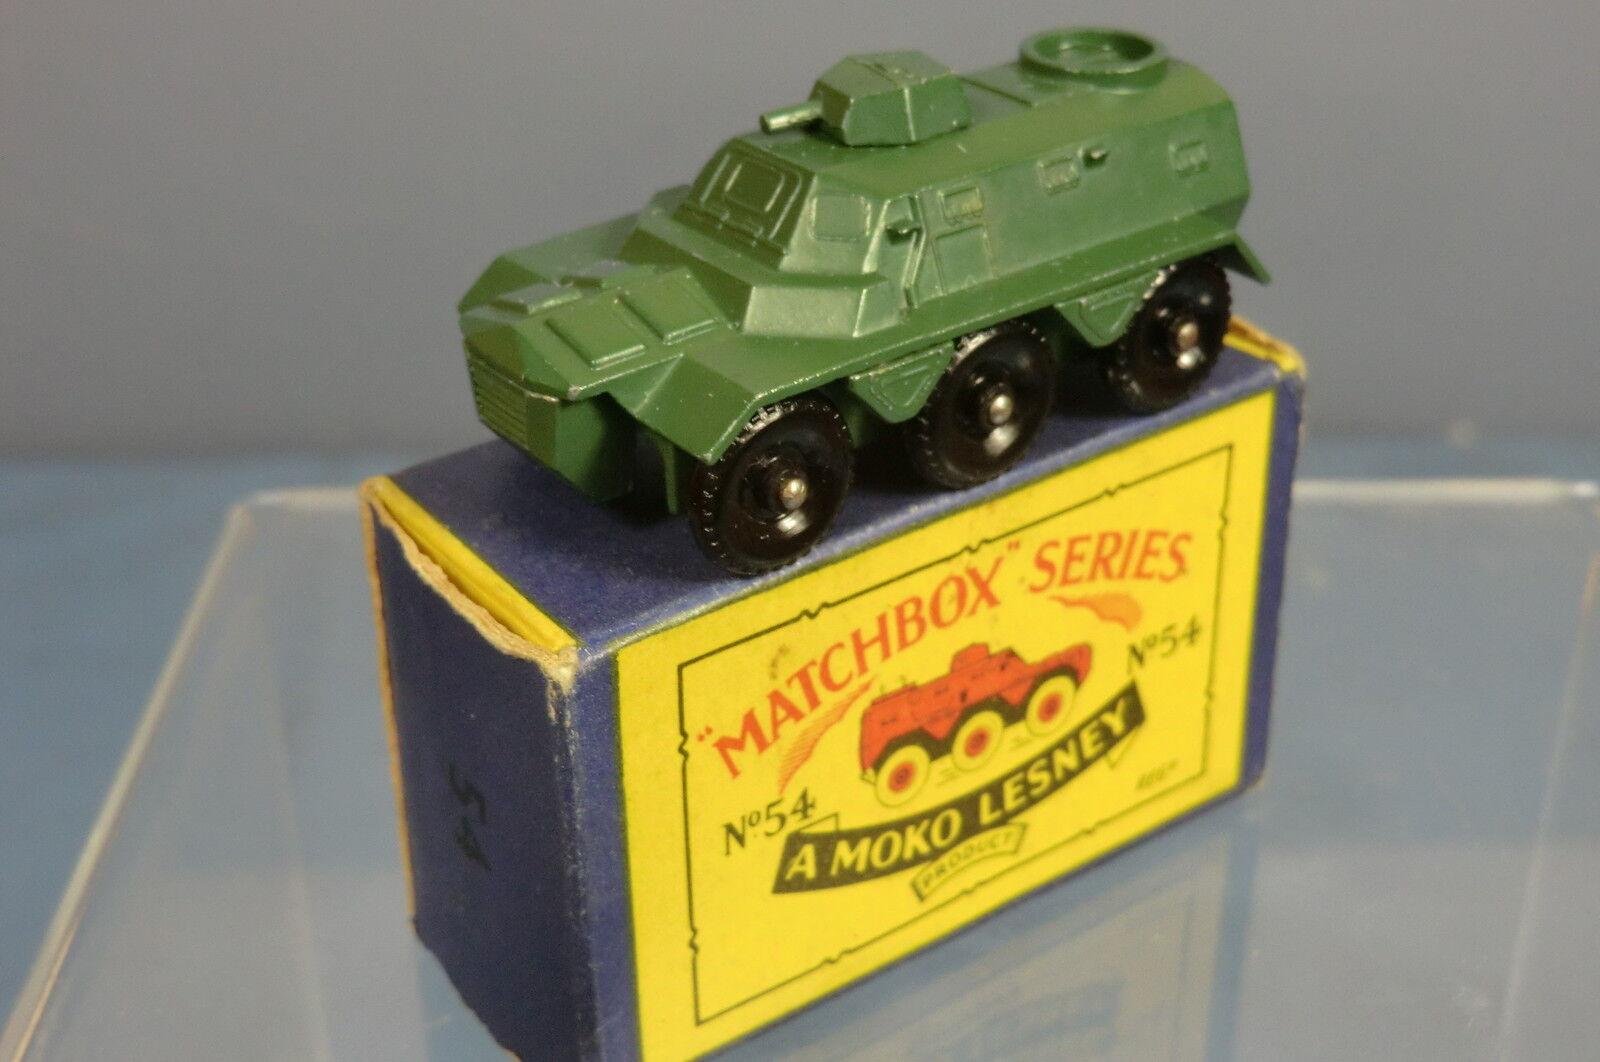 Matchbox moko lesney model model model No.54a